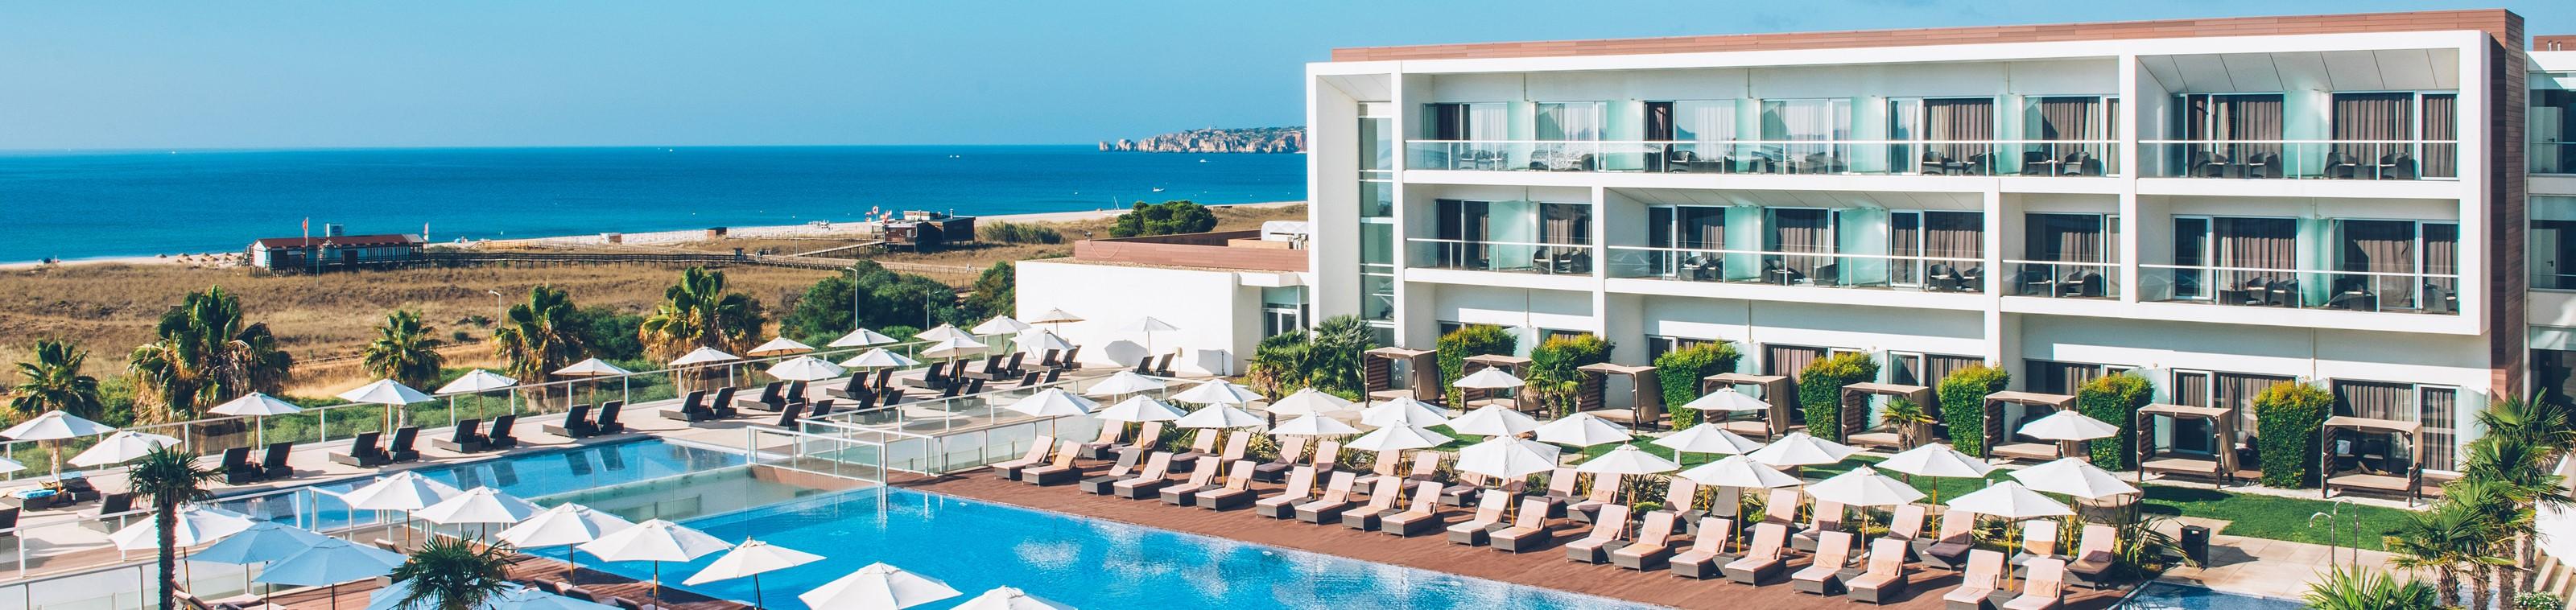 Onberispelijke service bij Iberostar Lagos Algarve